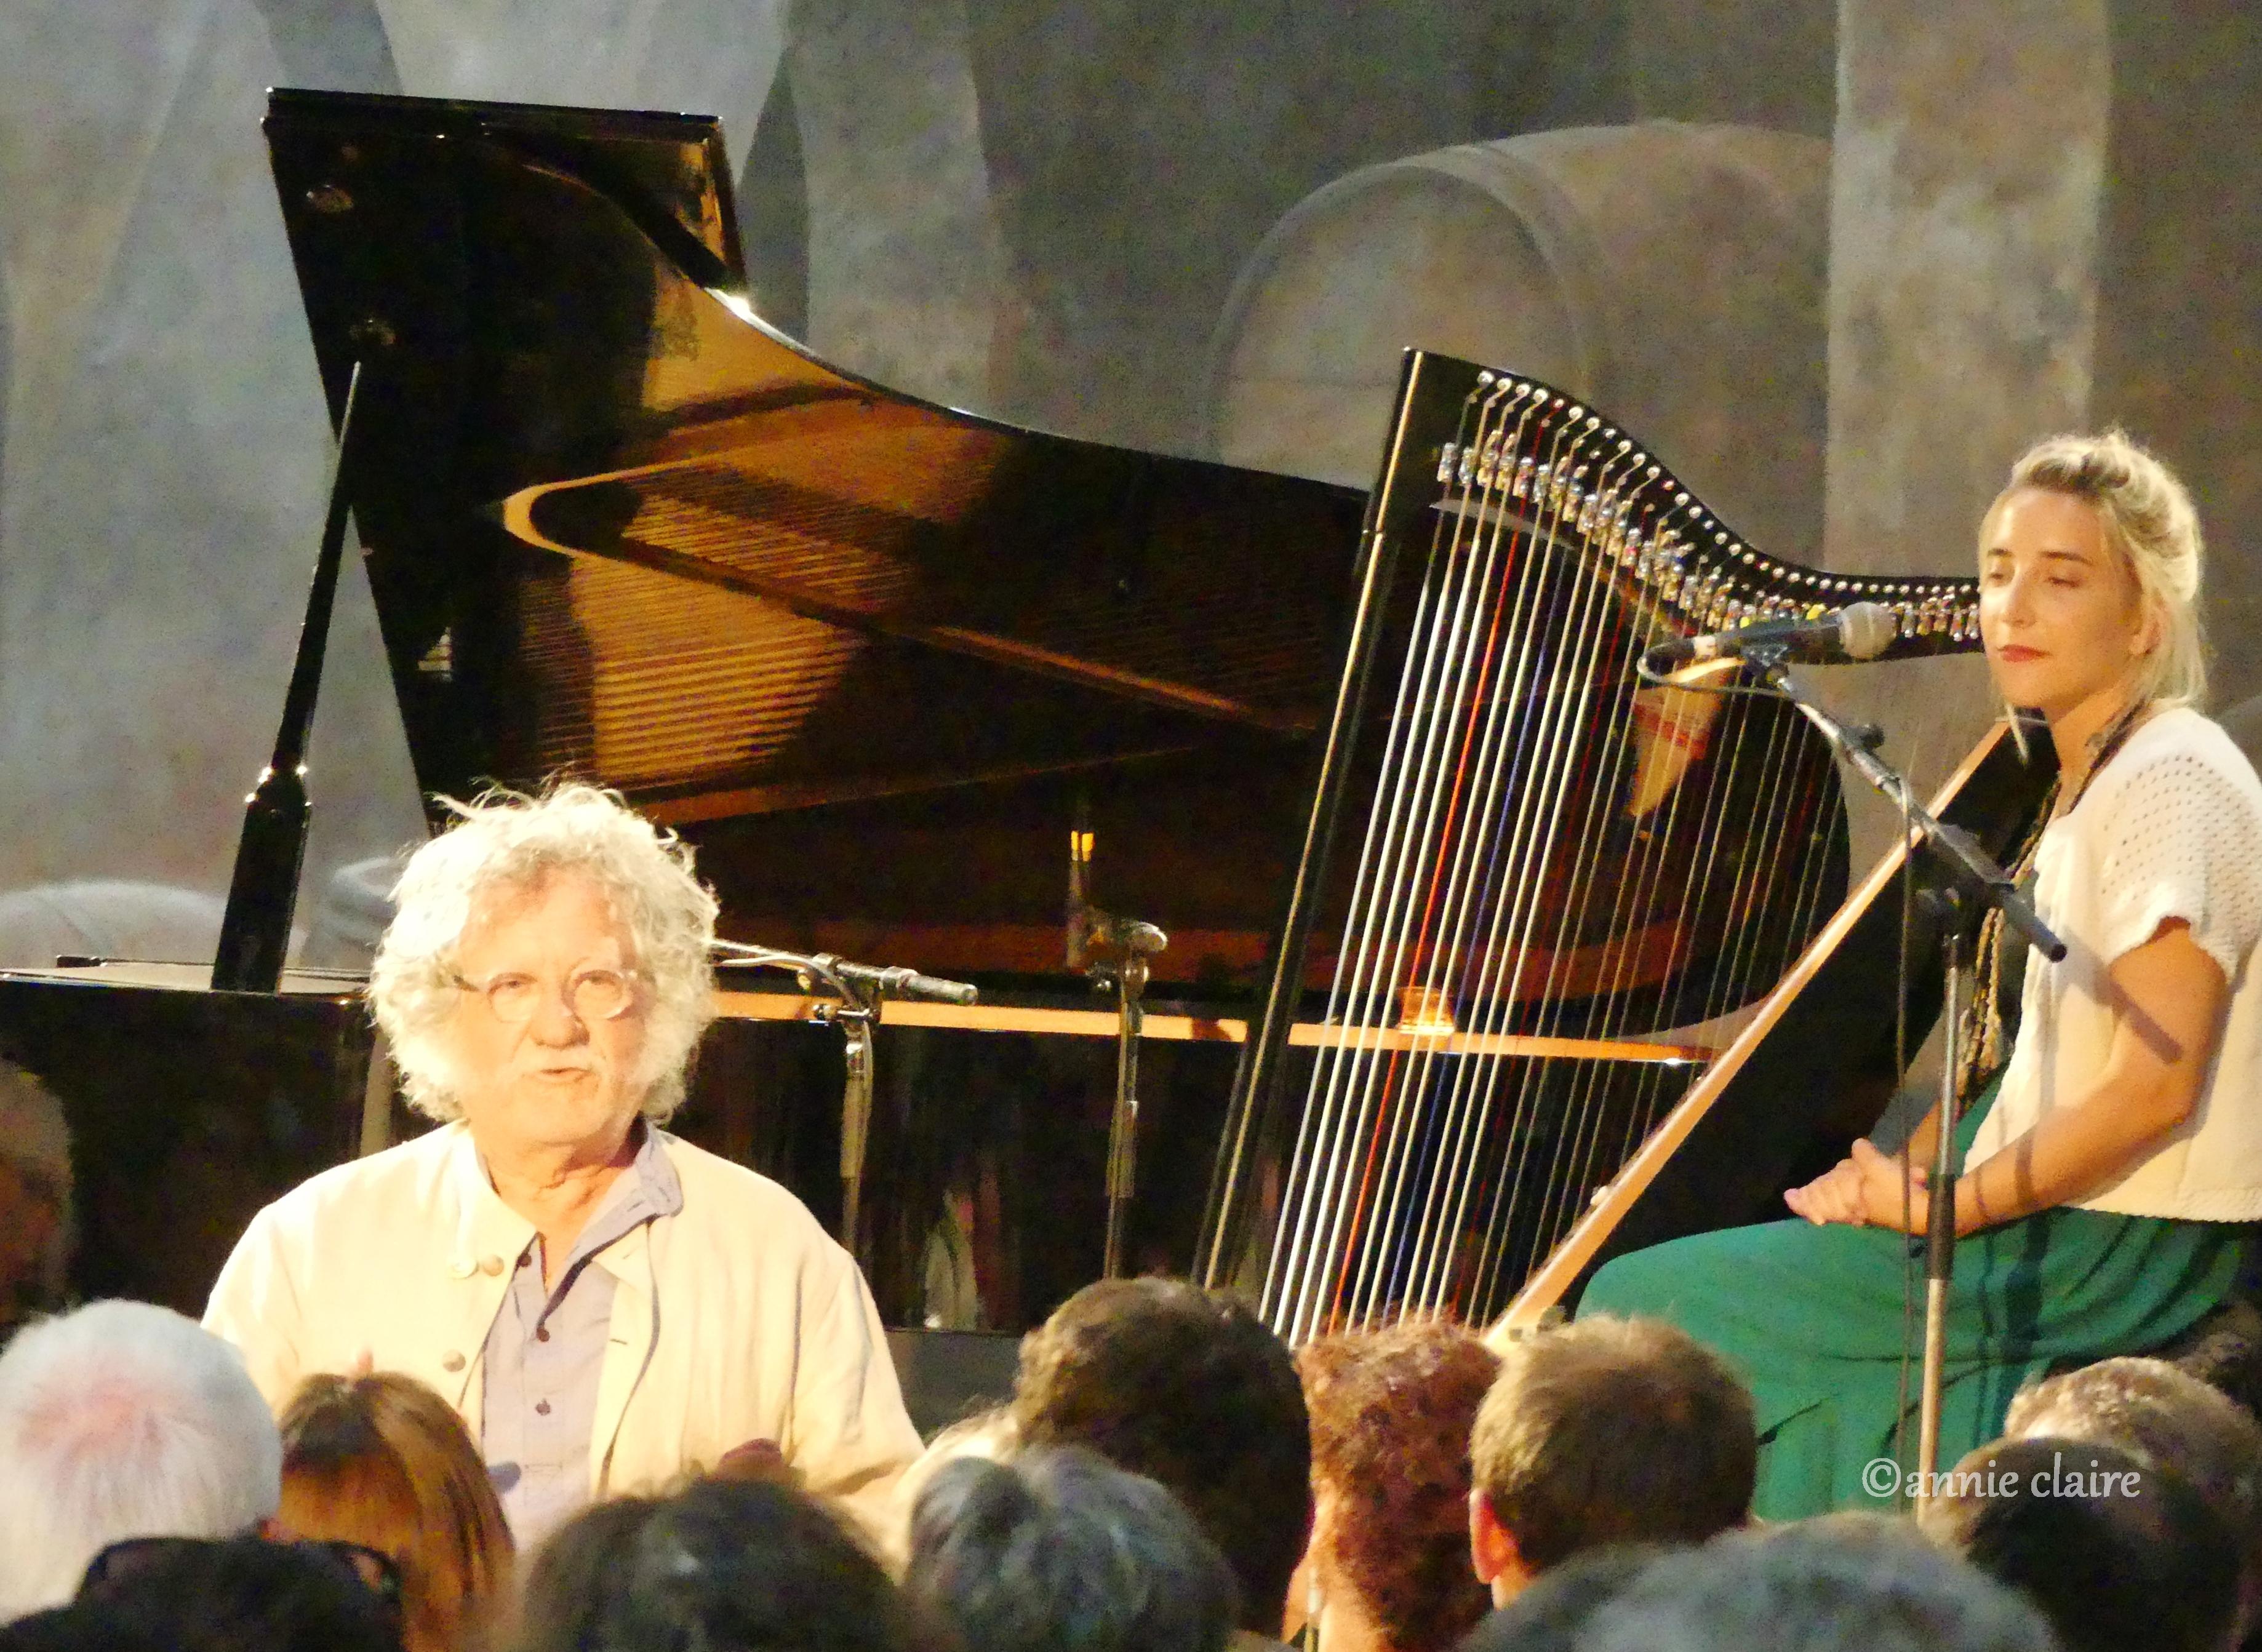 Jean-Pierre Béal annonce Mila Marina à la harpe qui accompagne Paulette Wright ©annie claire